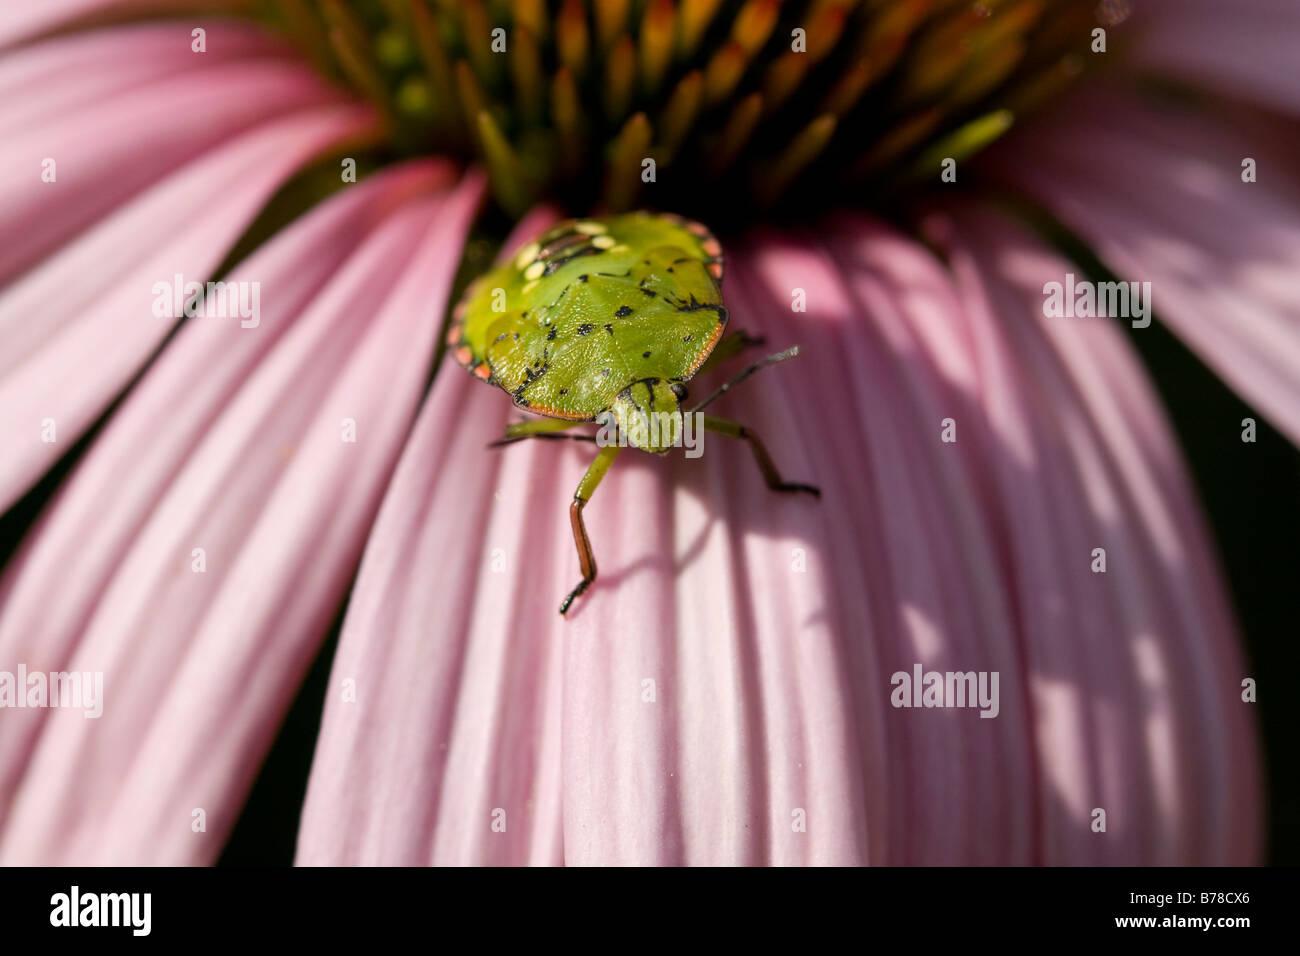 green shield beetle on pink echinacea flower - Stock Image